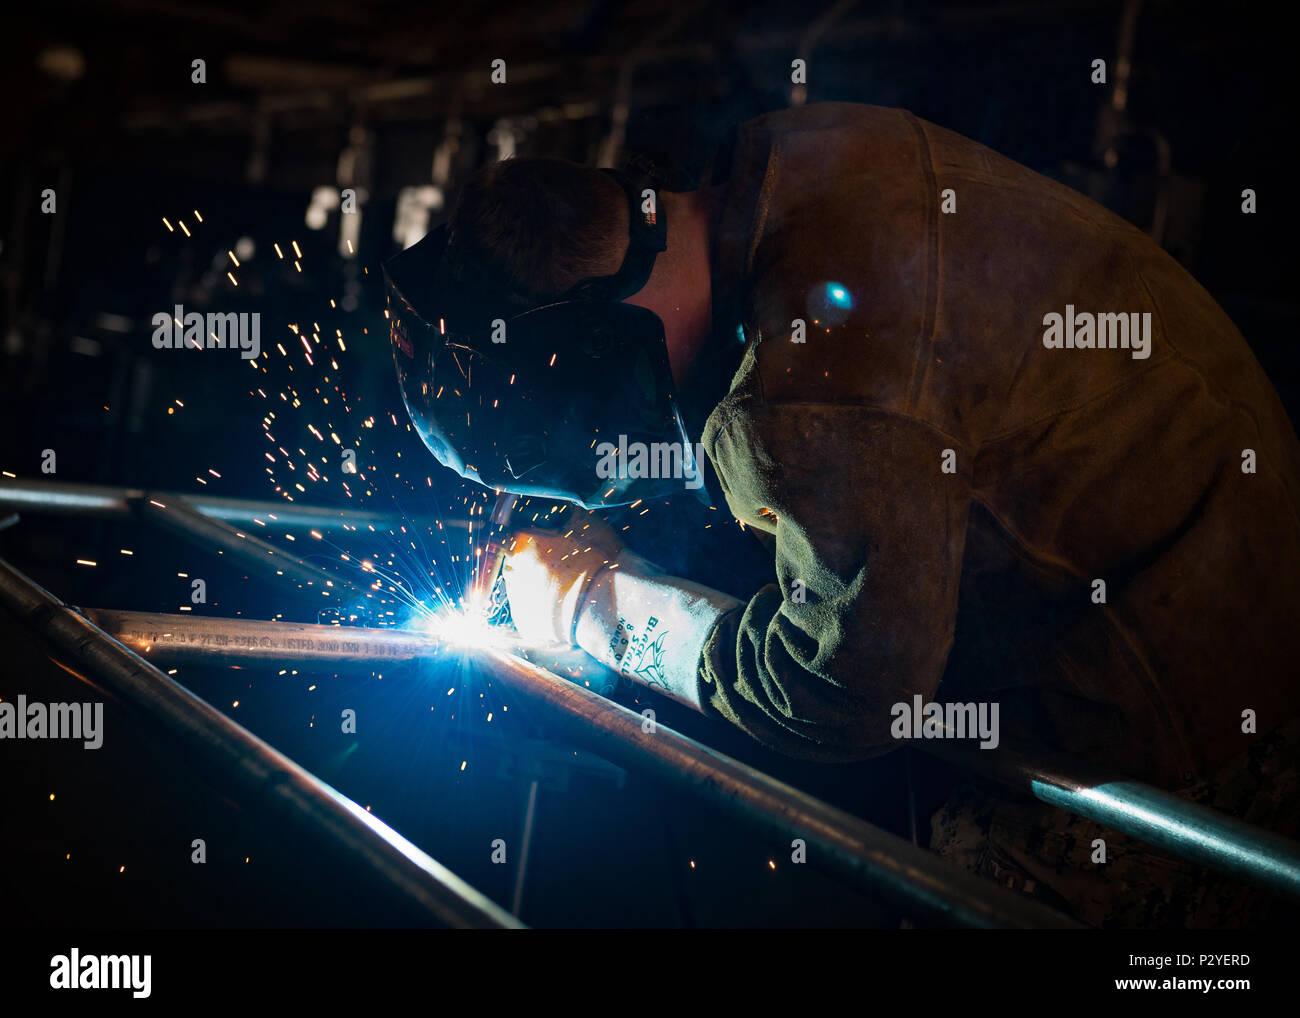 Mig 9 Stock Photos & Mig 9 Stock Images - Alamy Hansen Mig Welder Wiring Diagram on